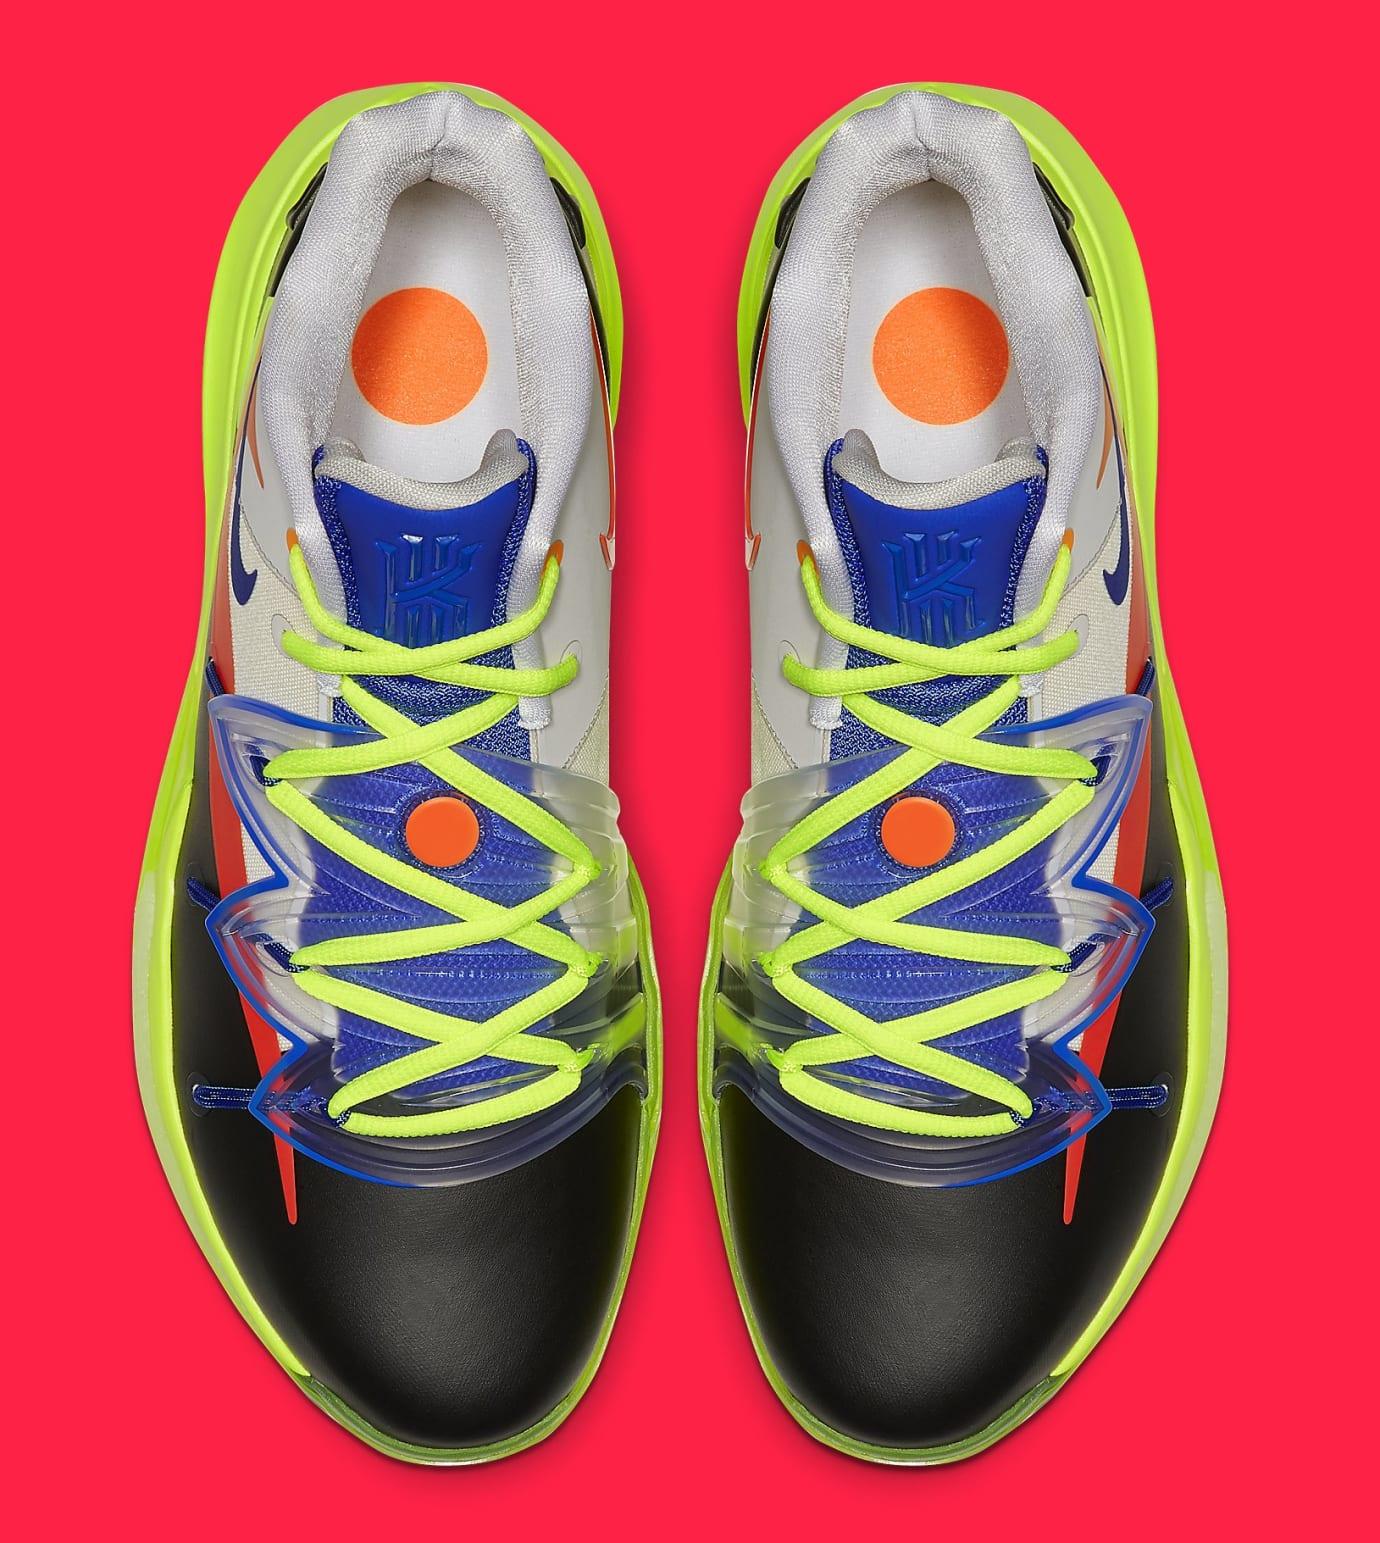 ROKIT x Nike Kyrie 5 'All-Star' CJ7853-900 Top